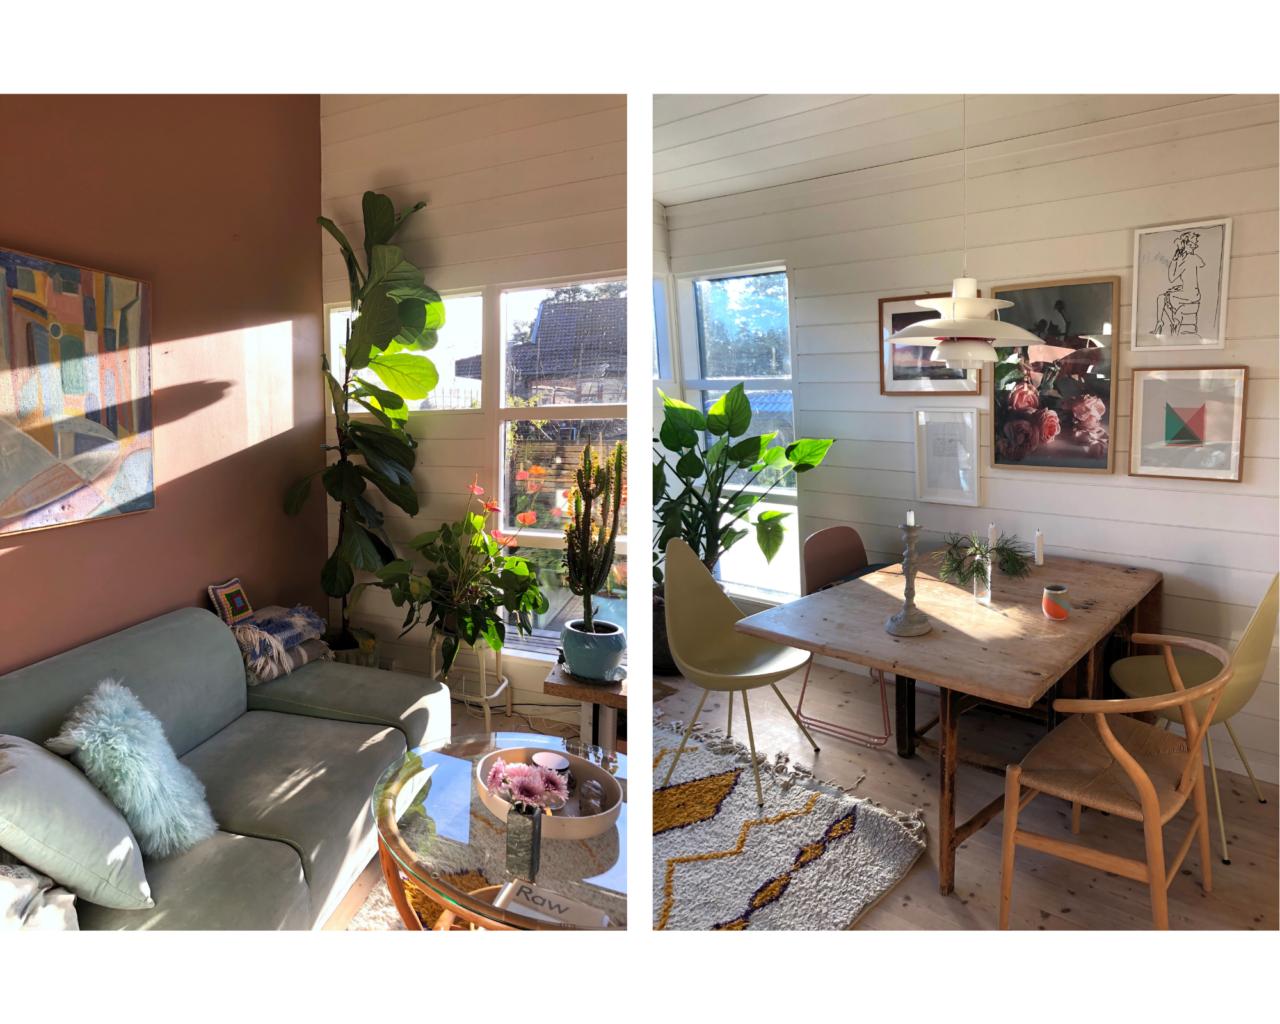 greenhouse-eco-gront-hus-miljovennlig-baerekraftig-interior